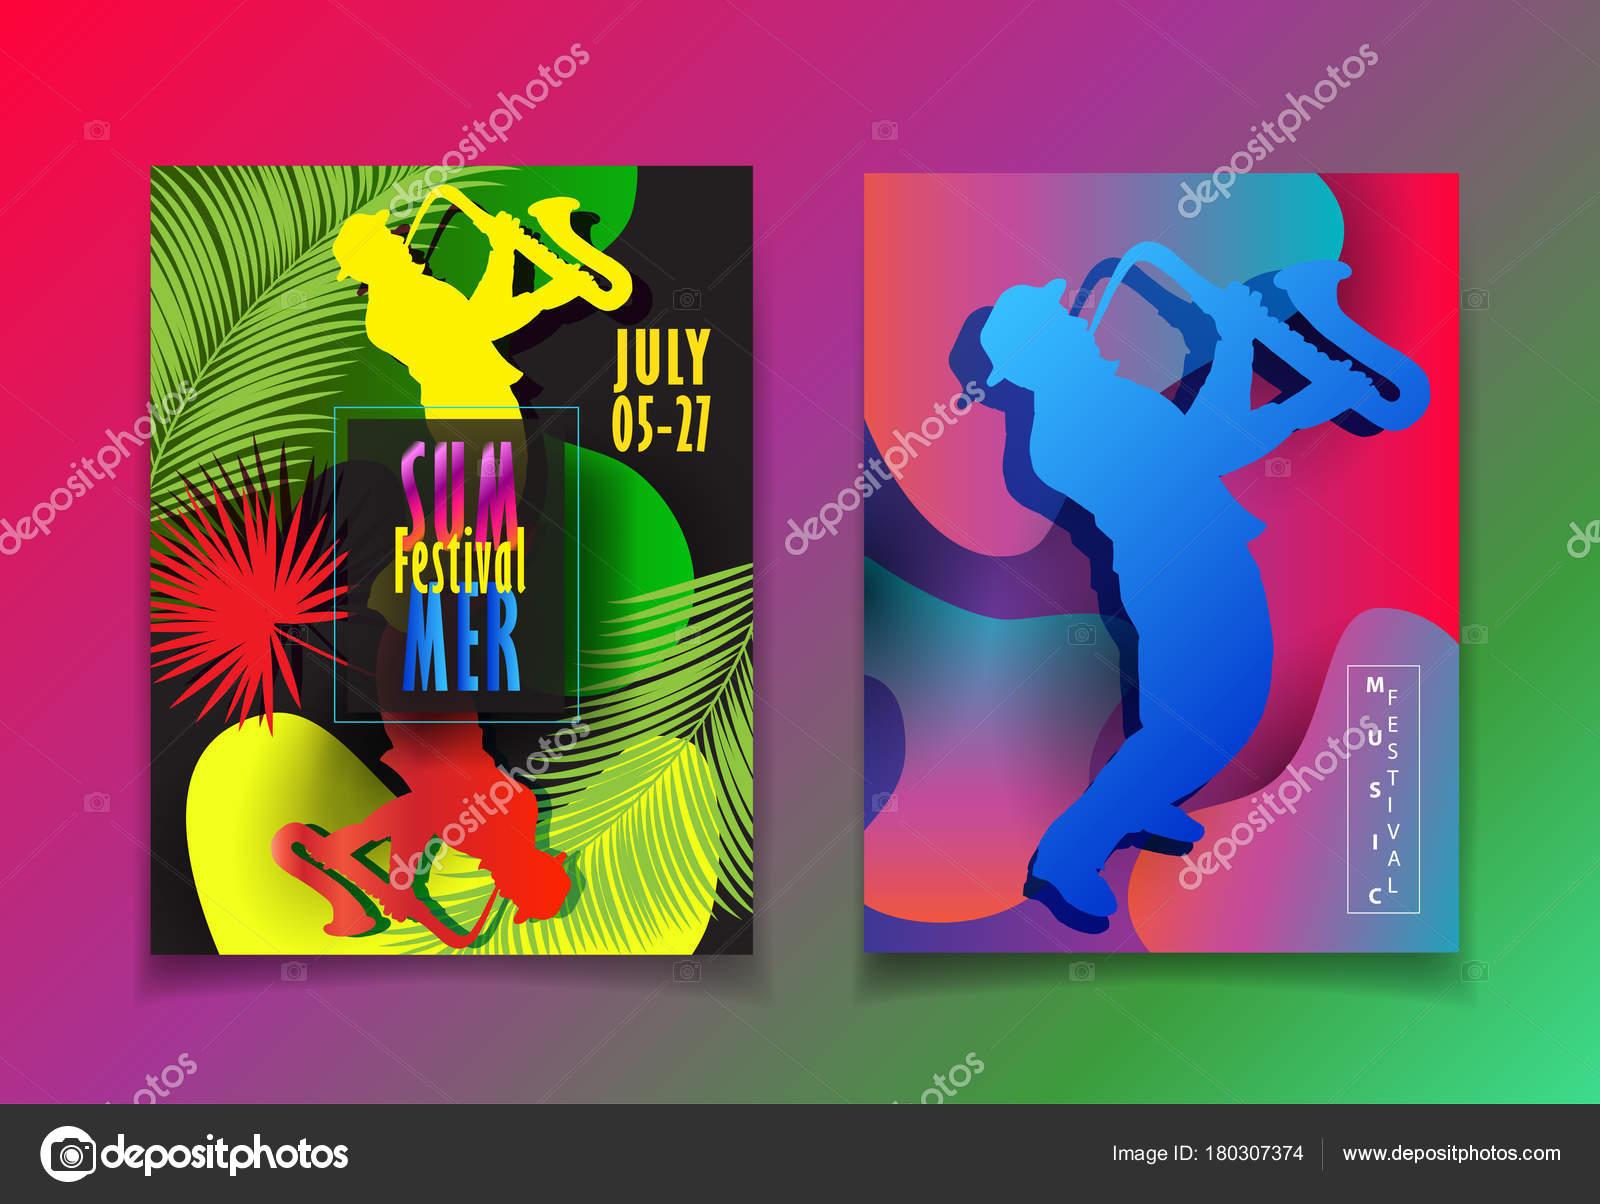 Jazz Pop Elektronische Musik Sommer Festival 2018 Musik Jazz Pop ...